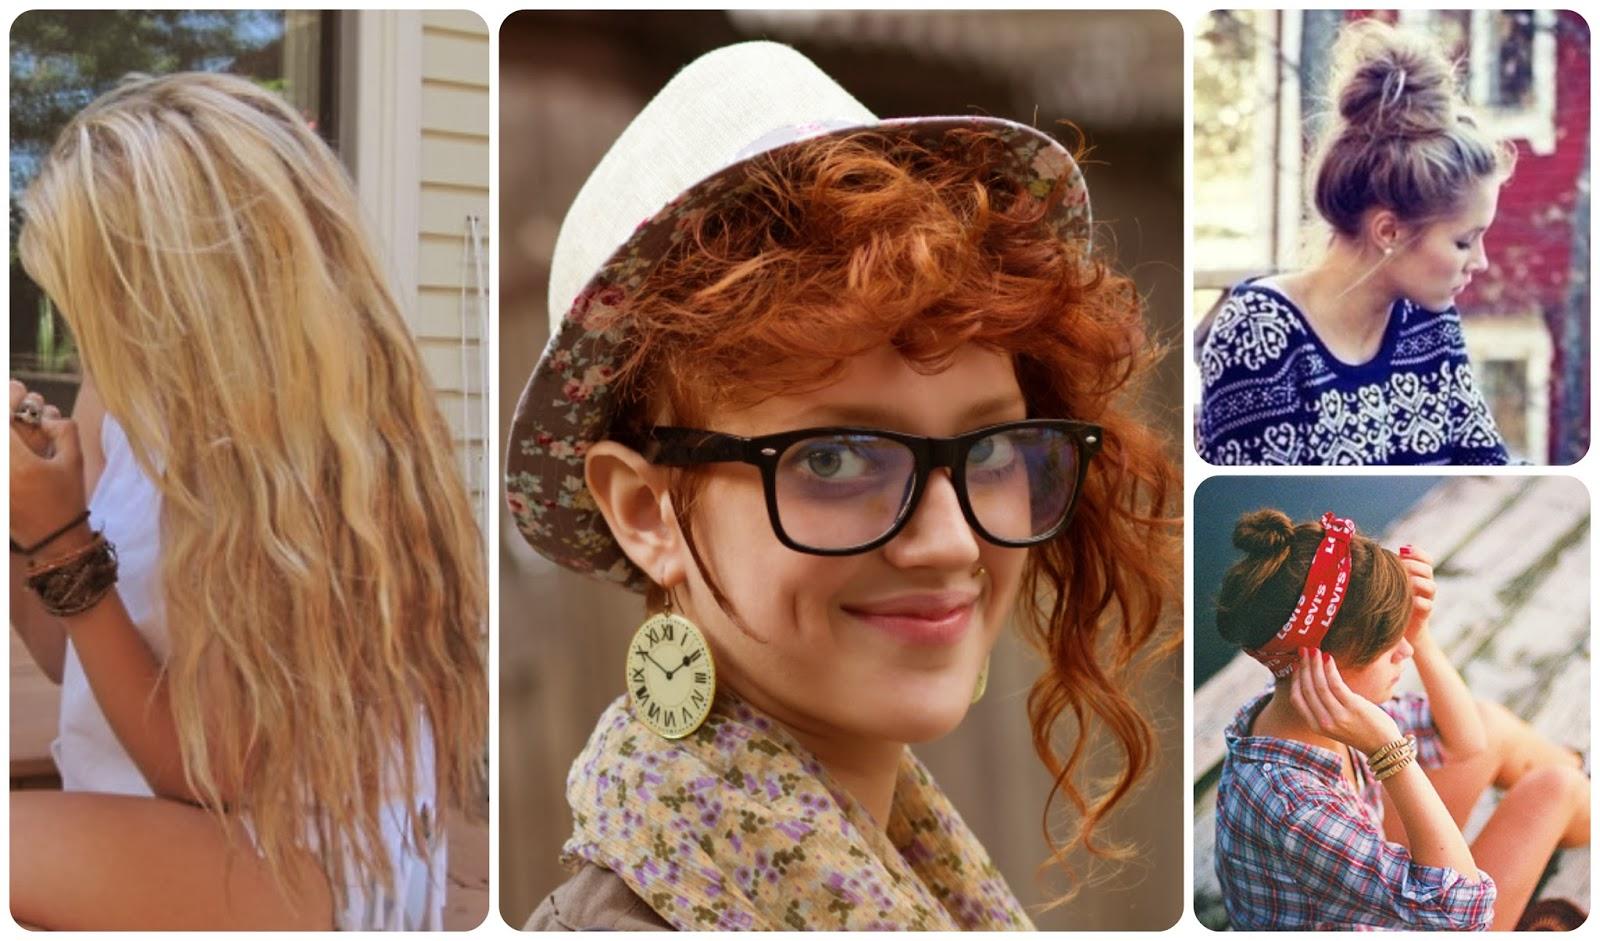 Hairstyle hipster girl - Peinados de la chica hisper. Melenas, moños, cortes asimétricos